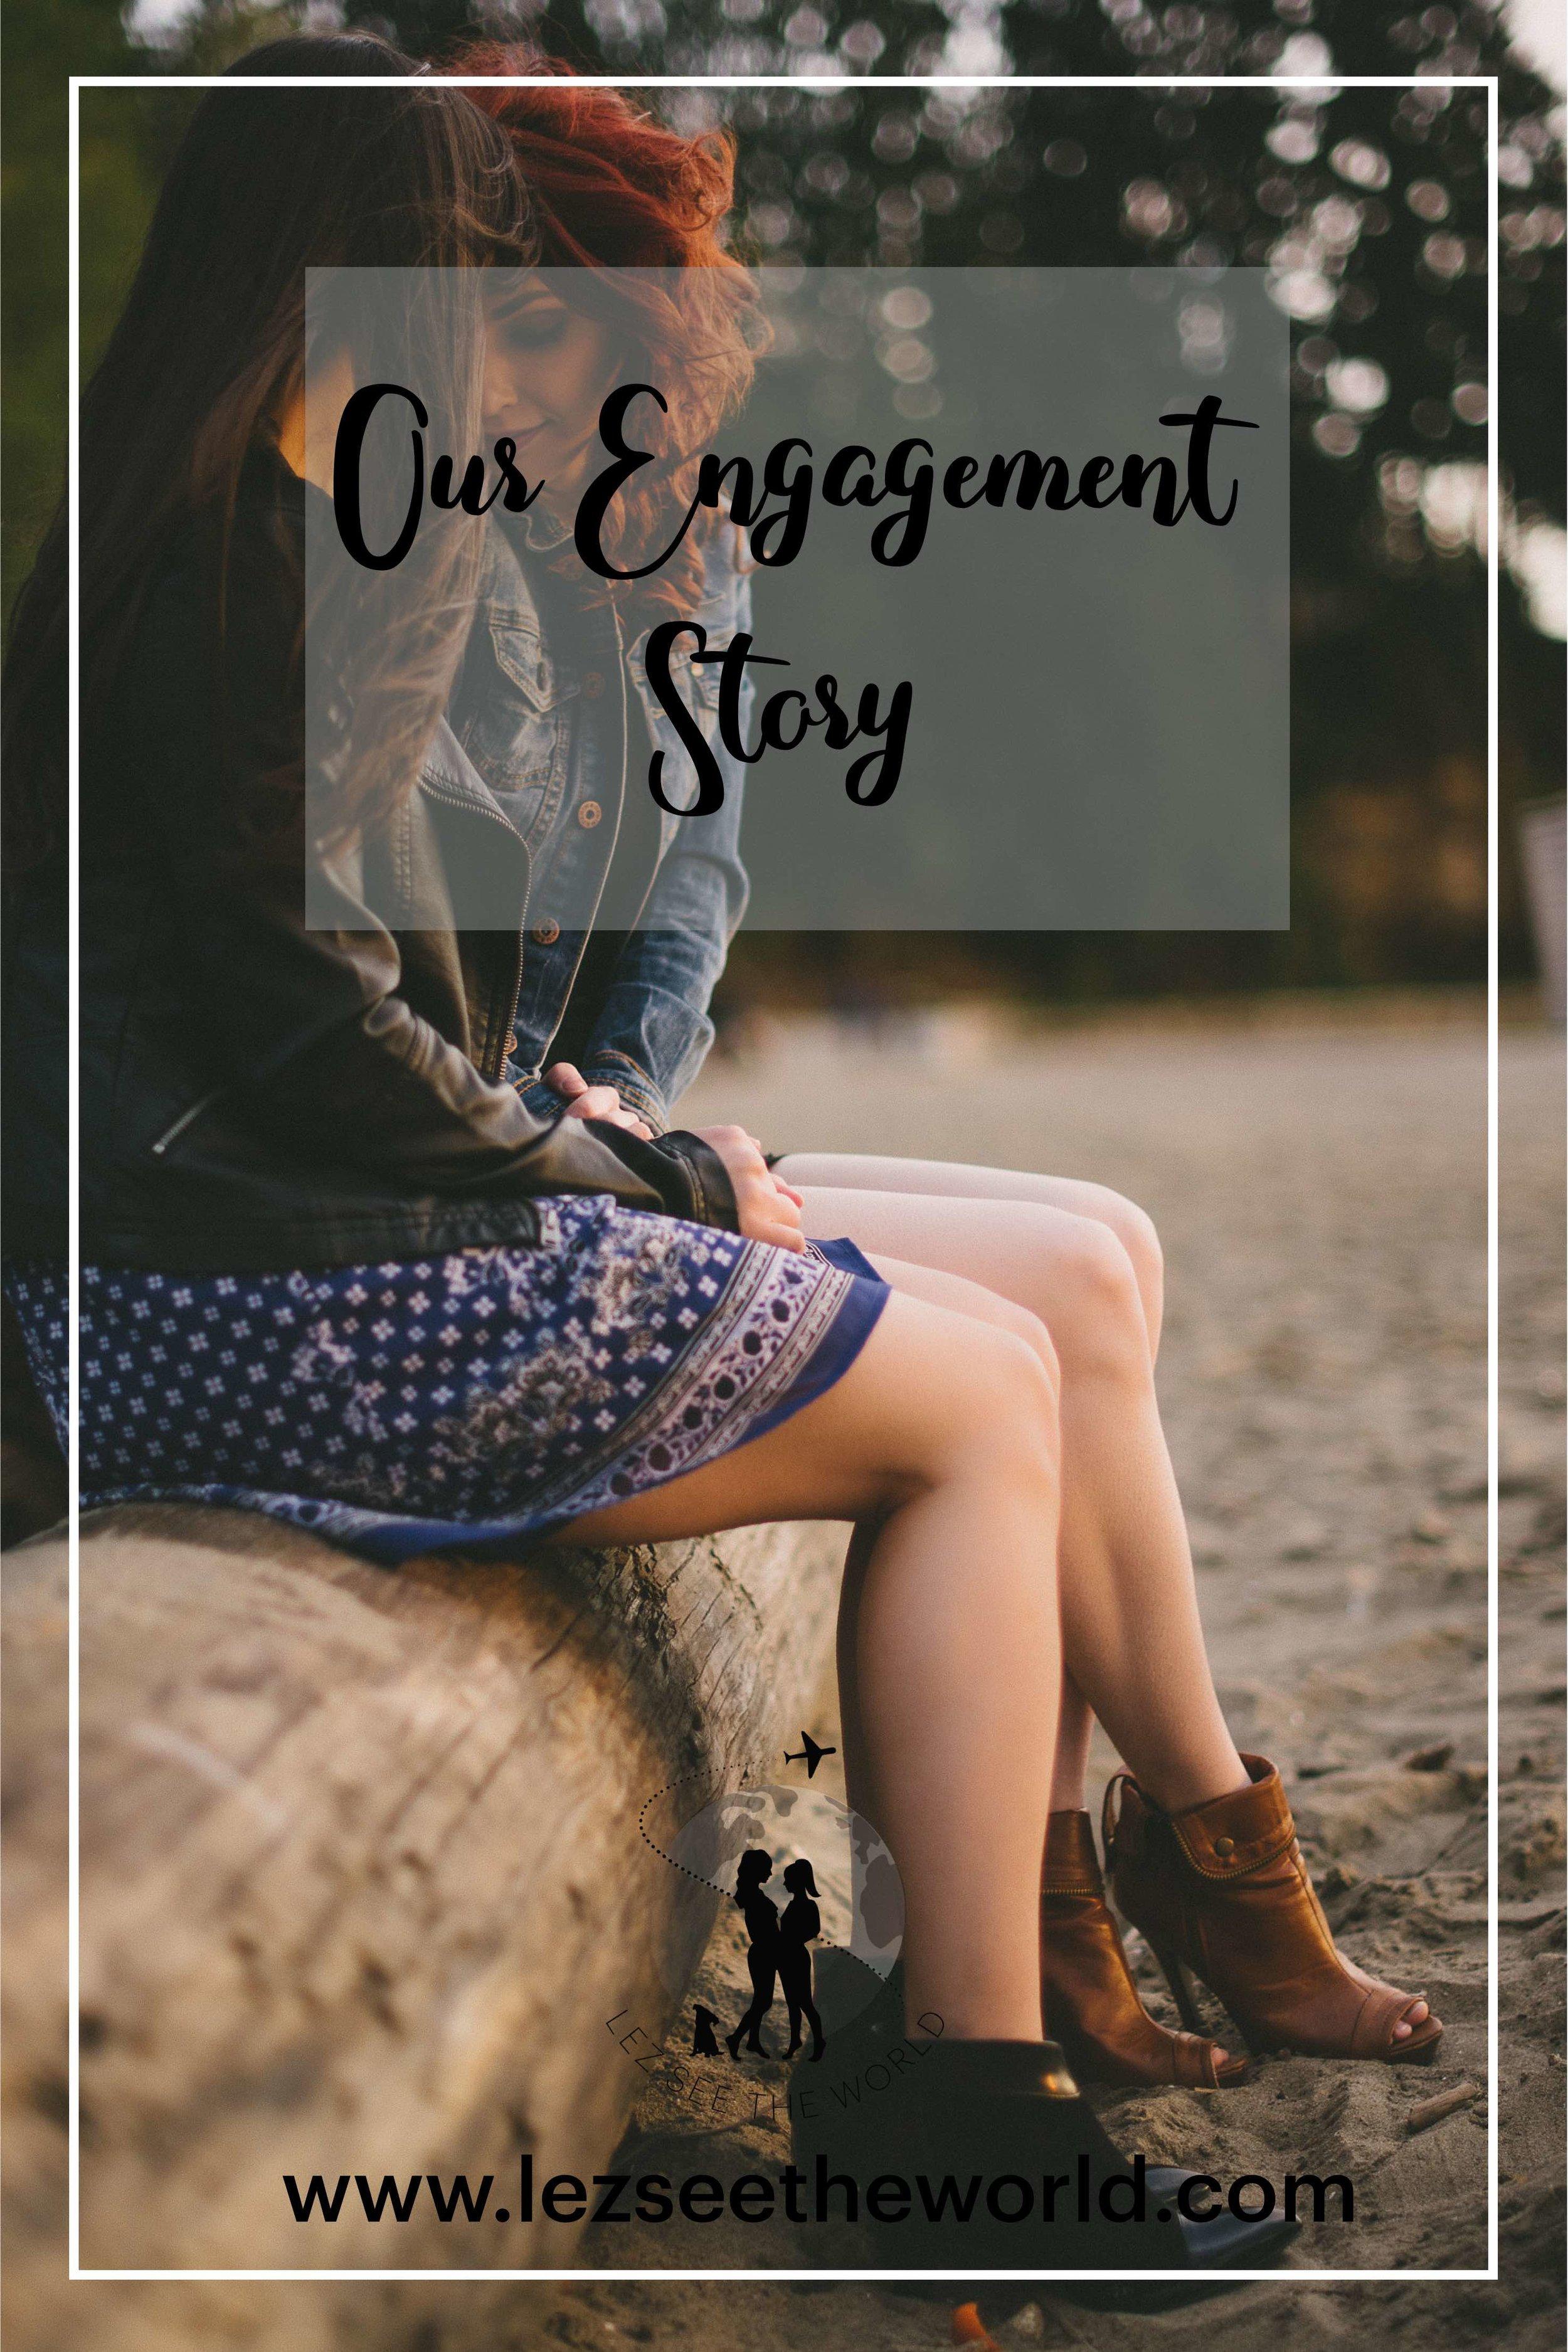 LSTW Pinterest Engagement 2.jpeg